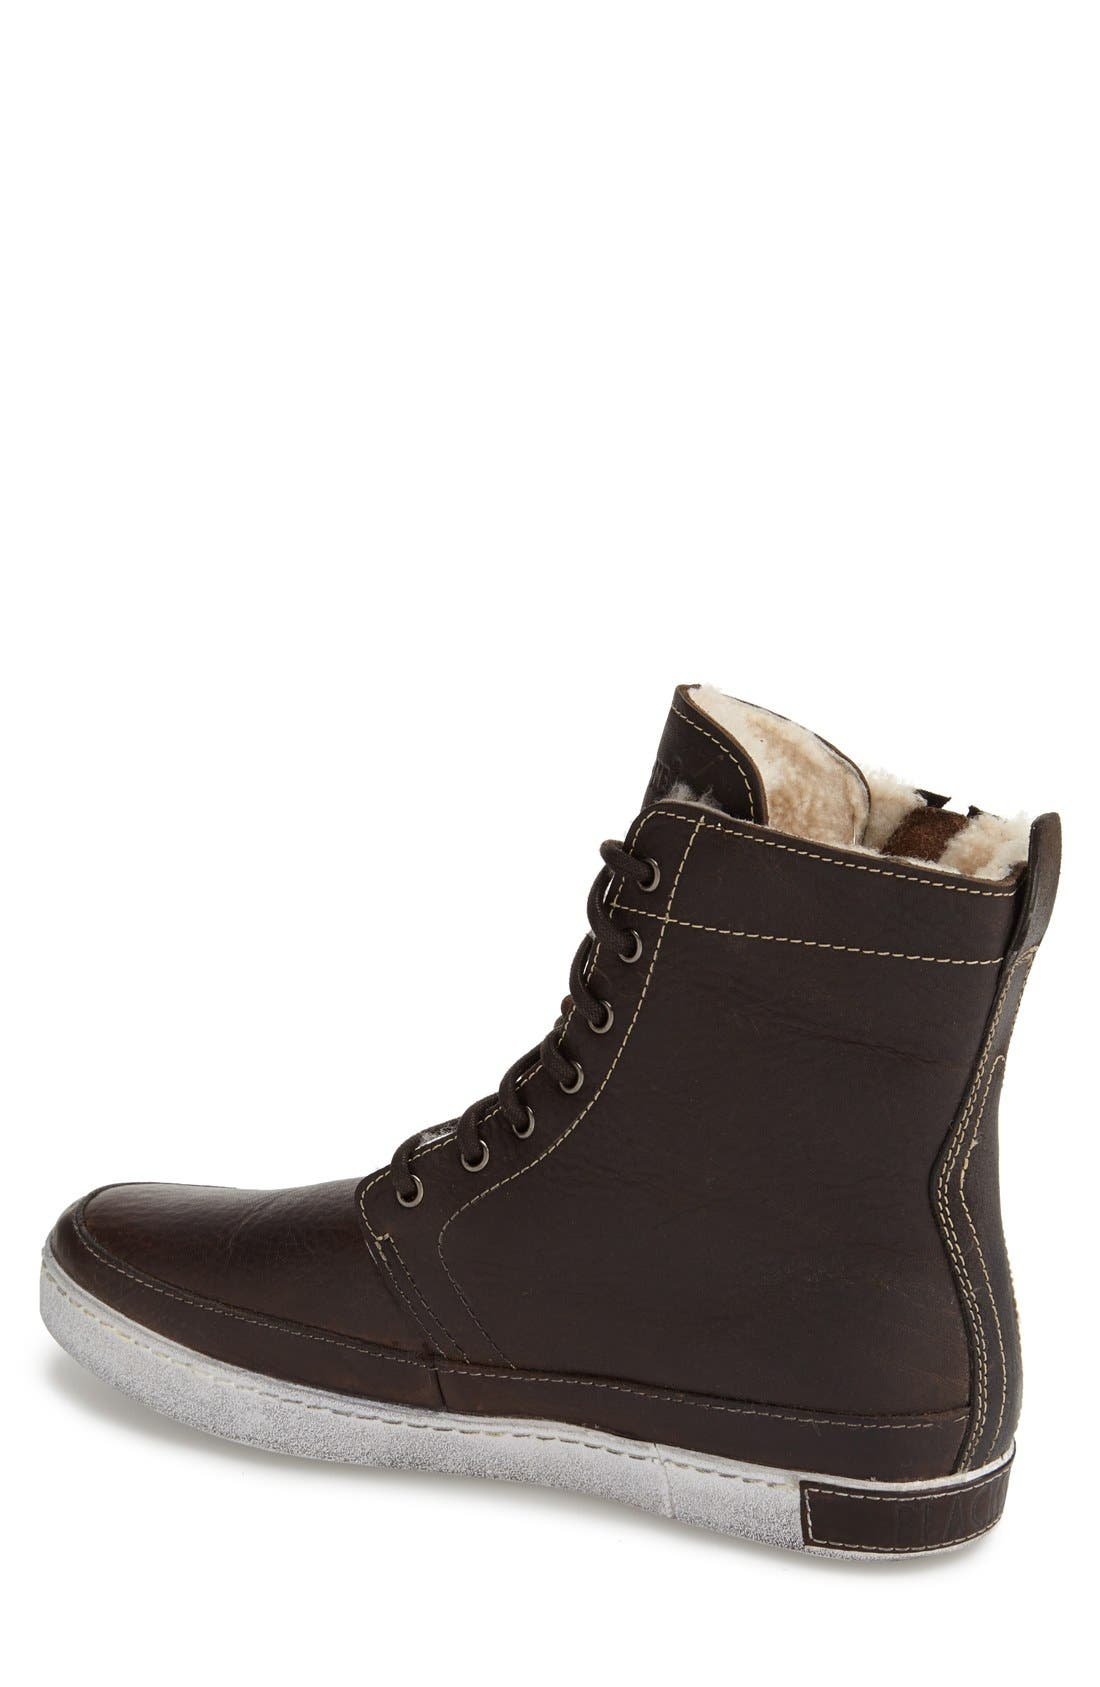 'GM05' High Top Sneaker,                             Alternate thumbnail 2, color,                             PINECONE